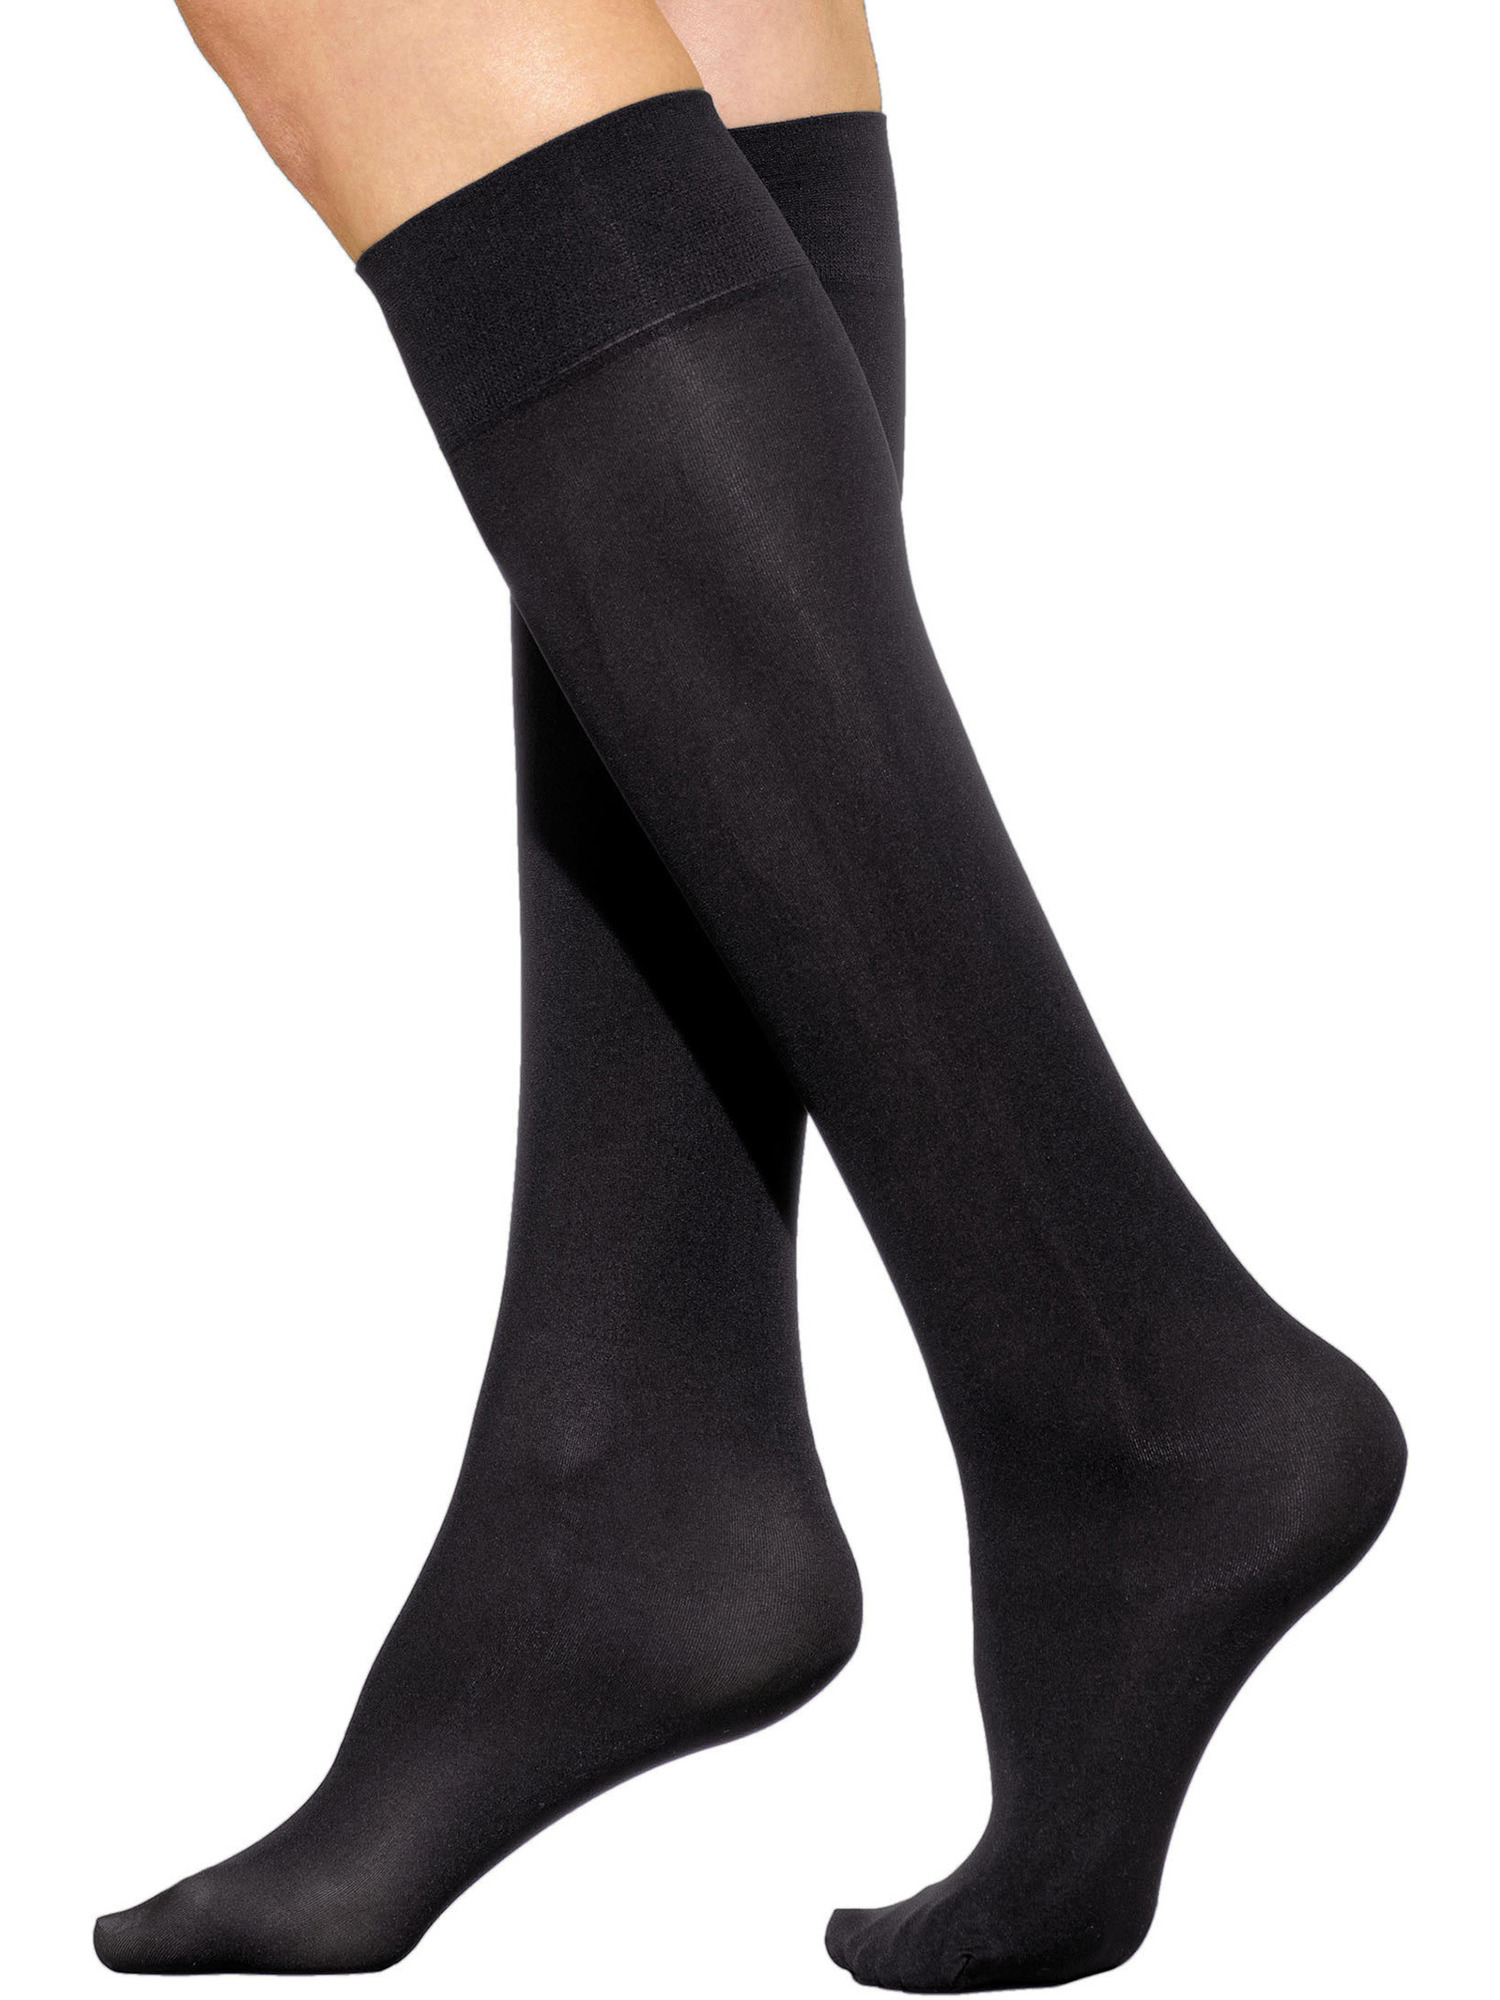 Knee Hi Socks Trouser Opaque 6 Colors White Black Brown Navy Nude or Grey